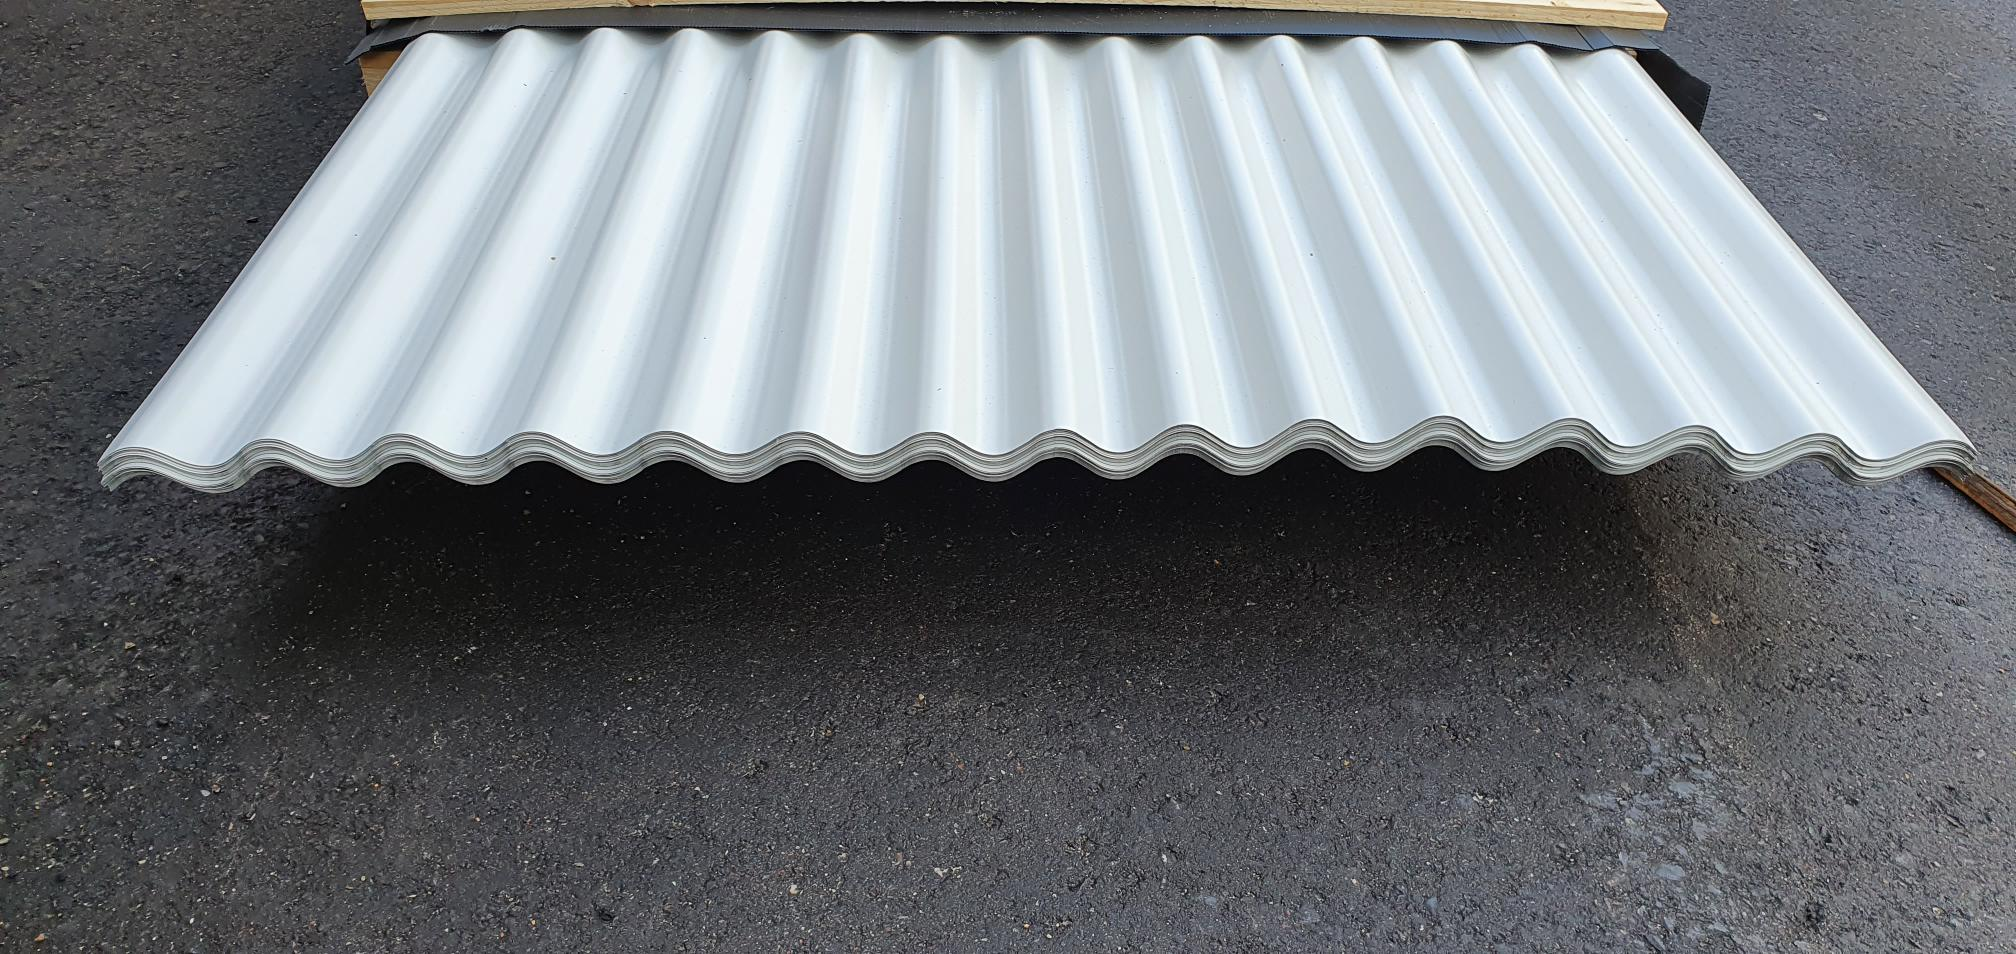 Outlet: Sinus P18, Hvid 119,25 m2 (1-sortering)